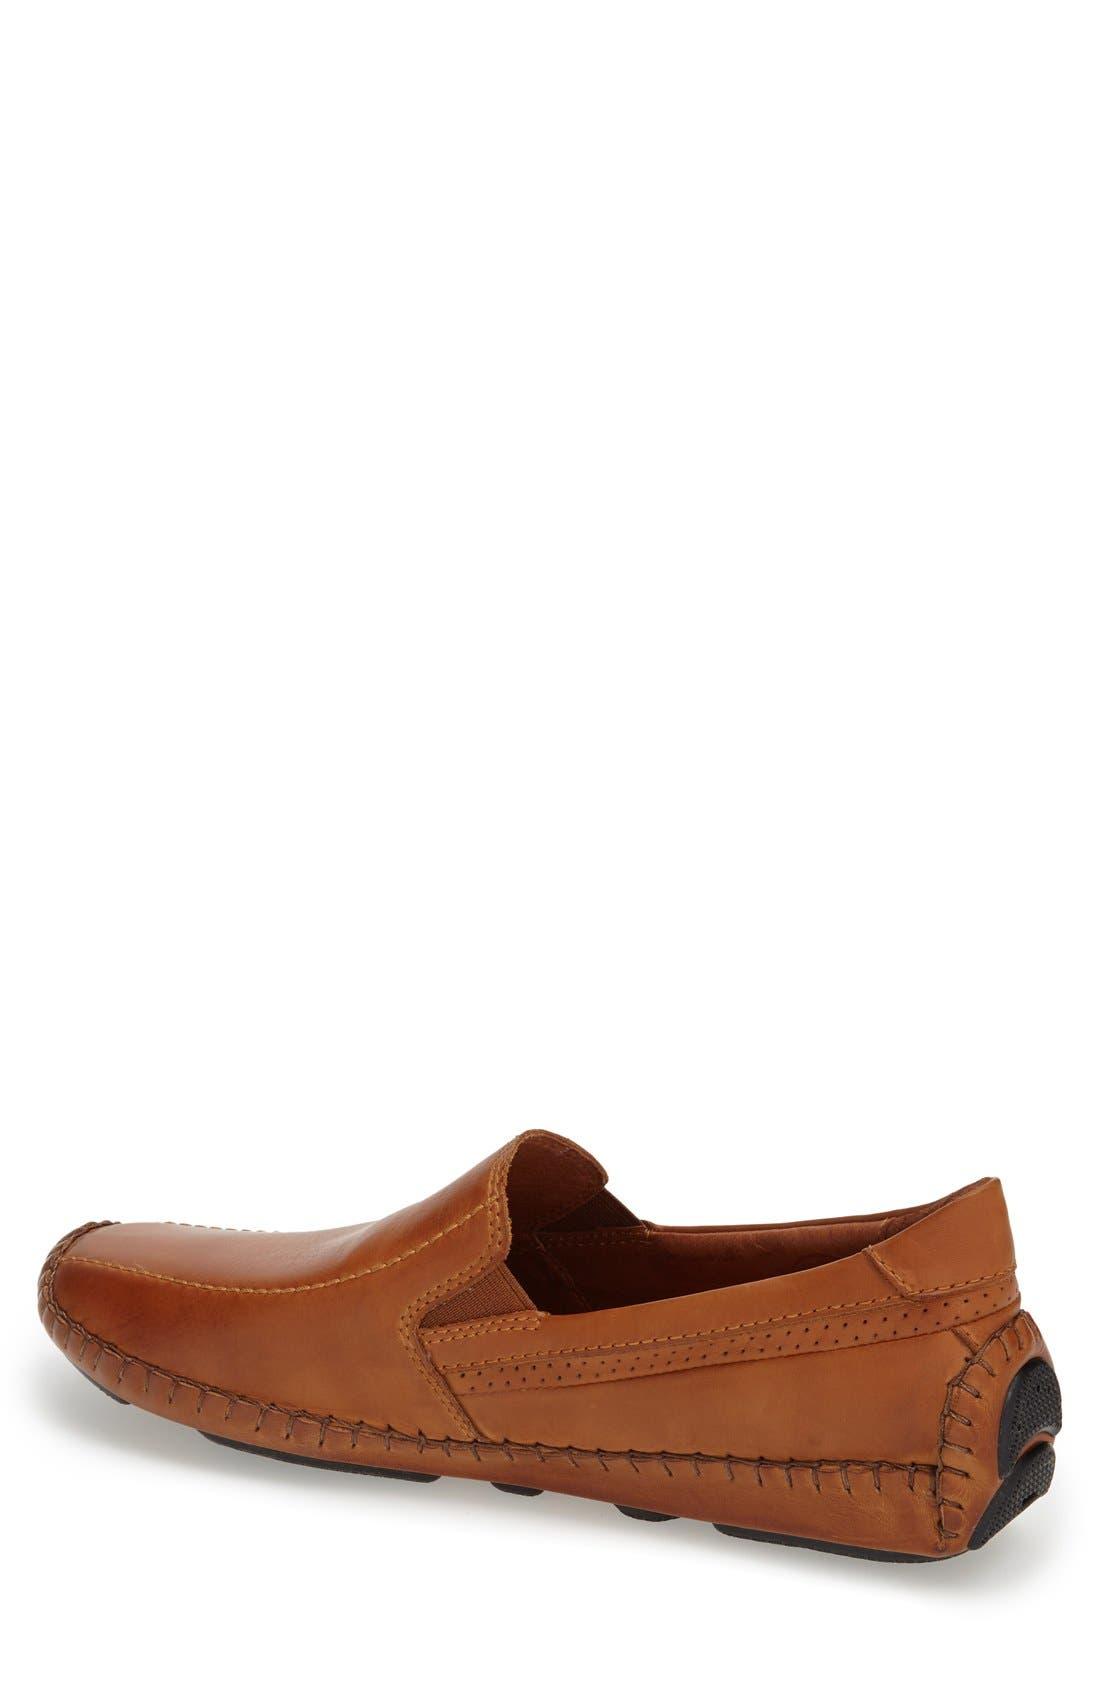 'Jerez' Driving Shoe,                             Alternate thumbnail 2, color,                             Brandy